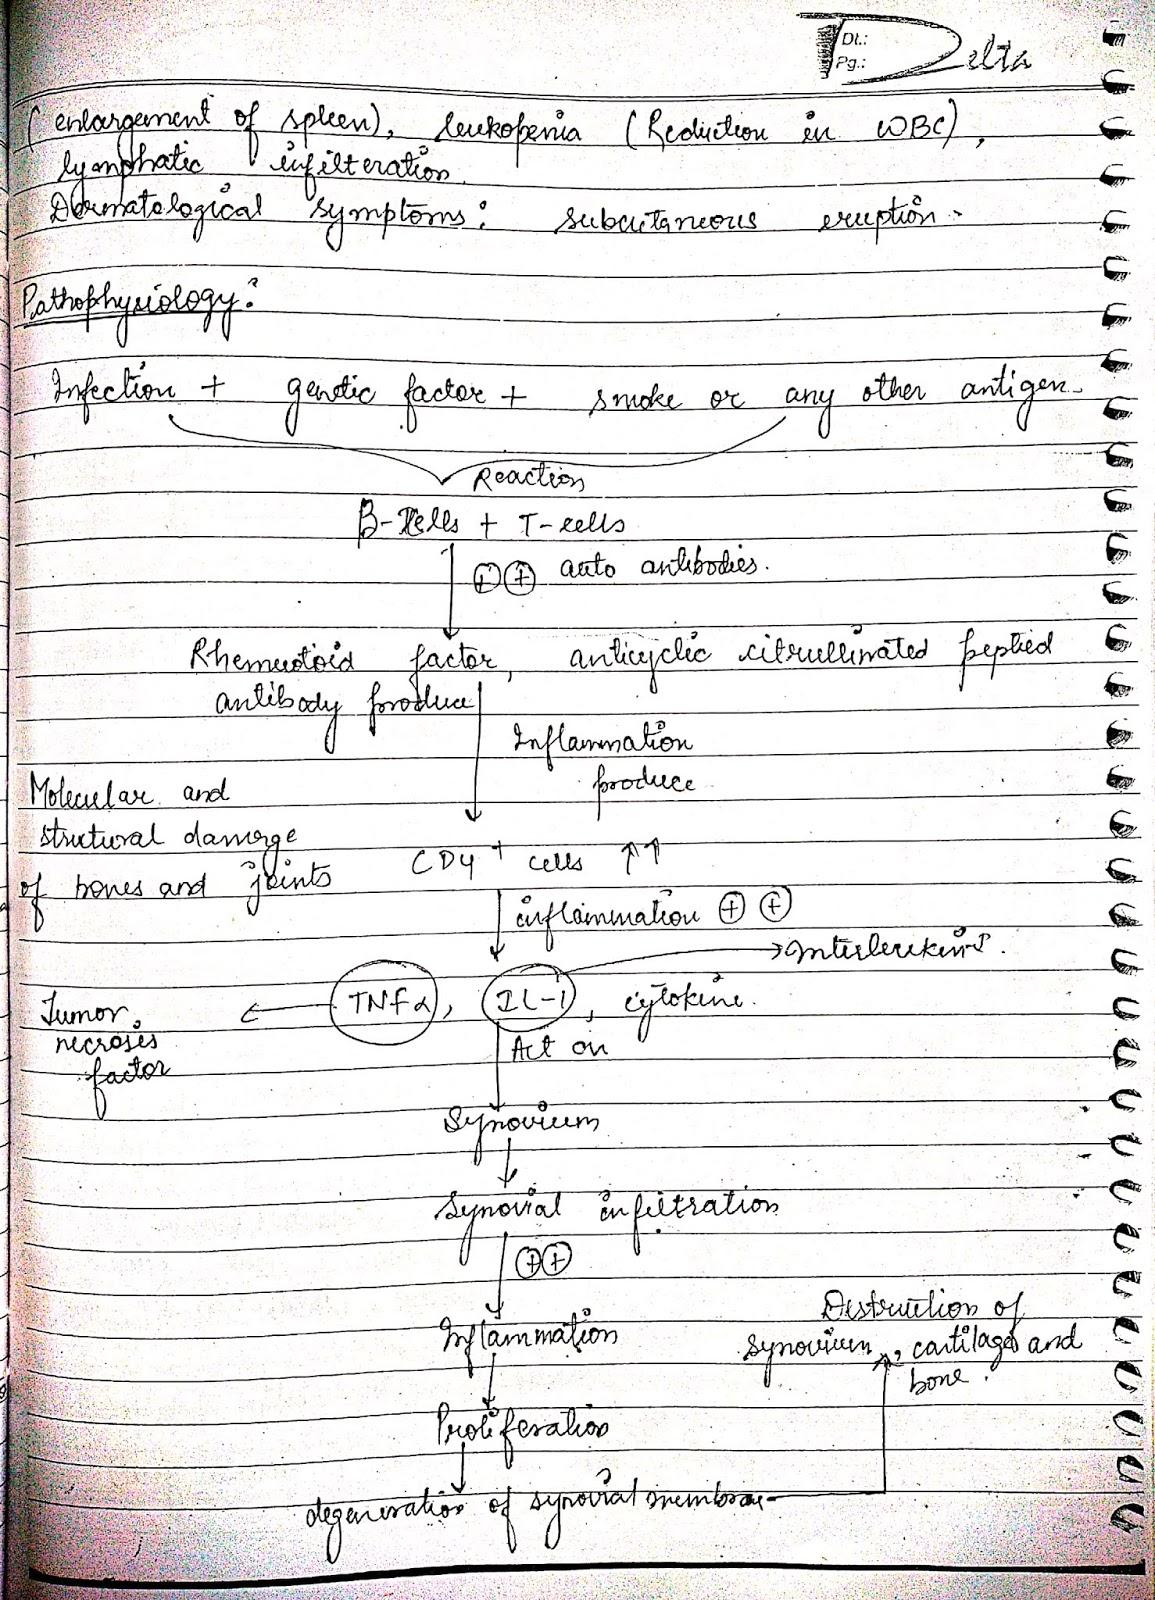 pathophysiology - rheumatoid arthritis